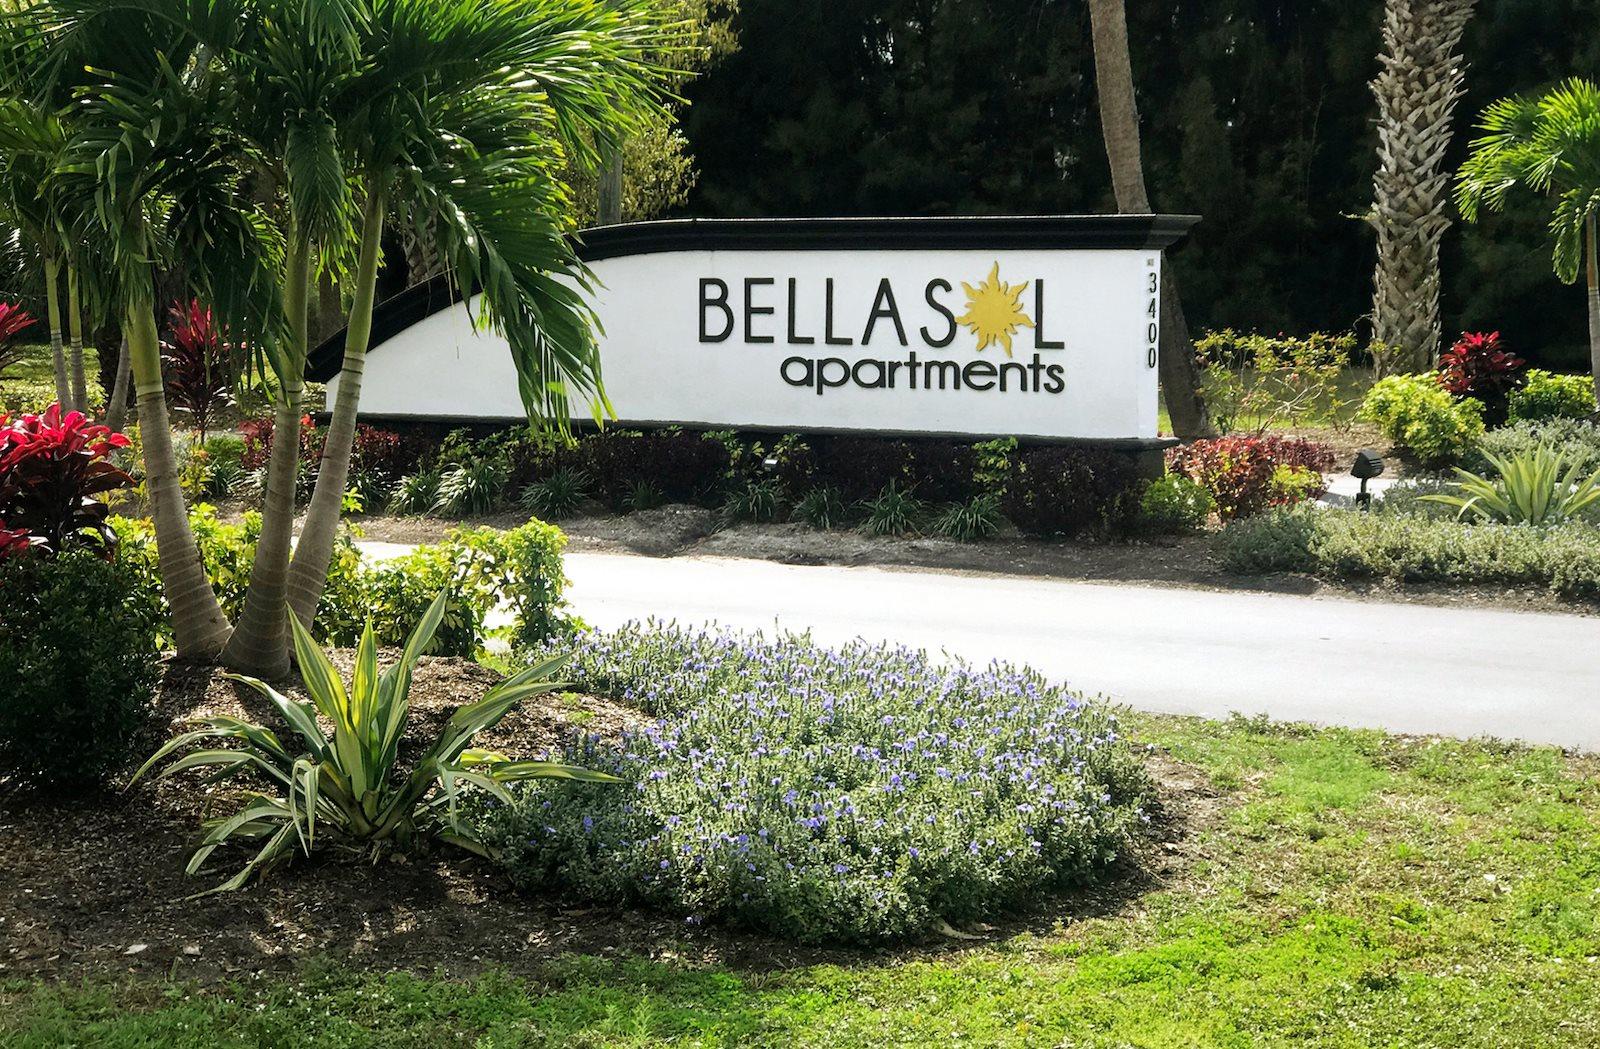 BellaSol Apartments in Sarasota, FL entrance signage